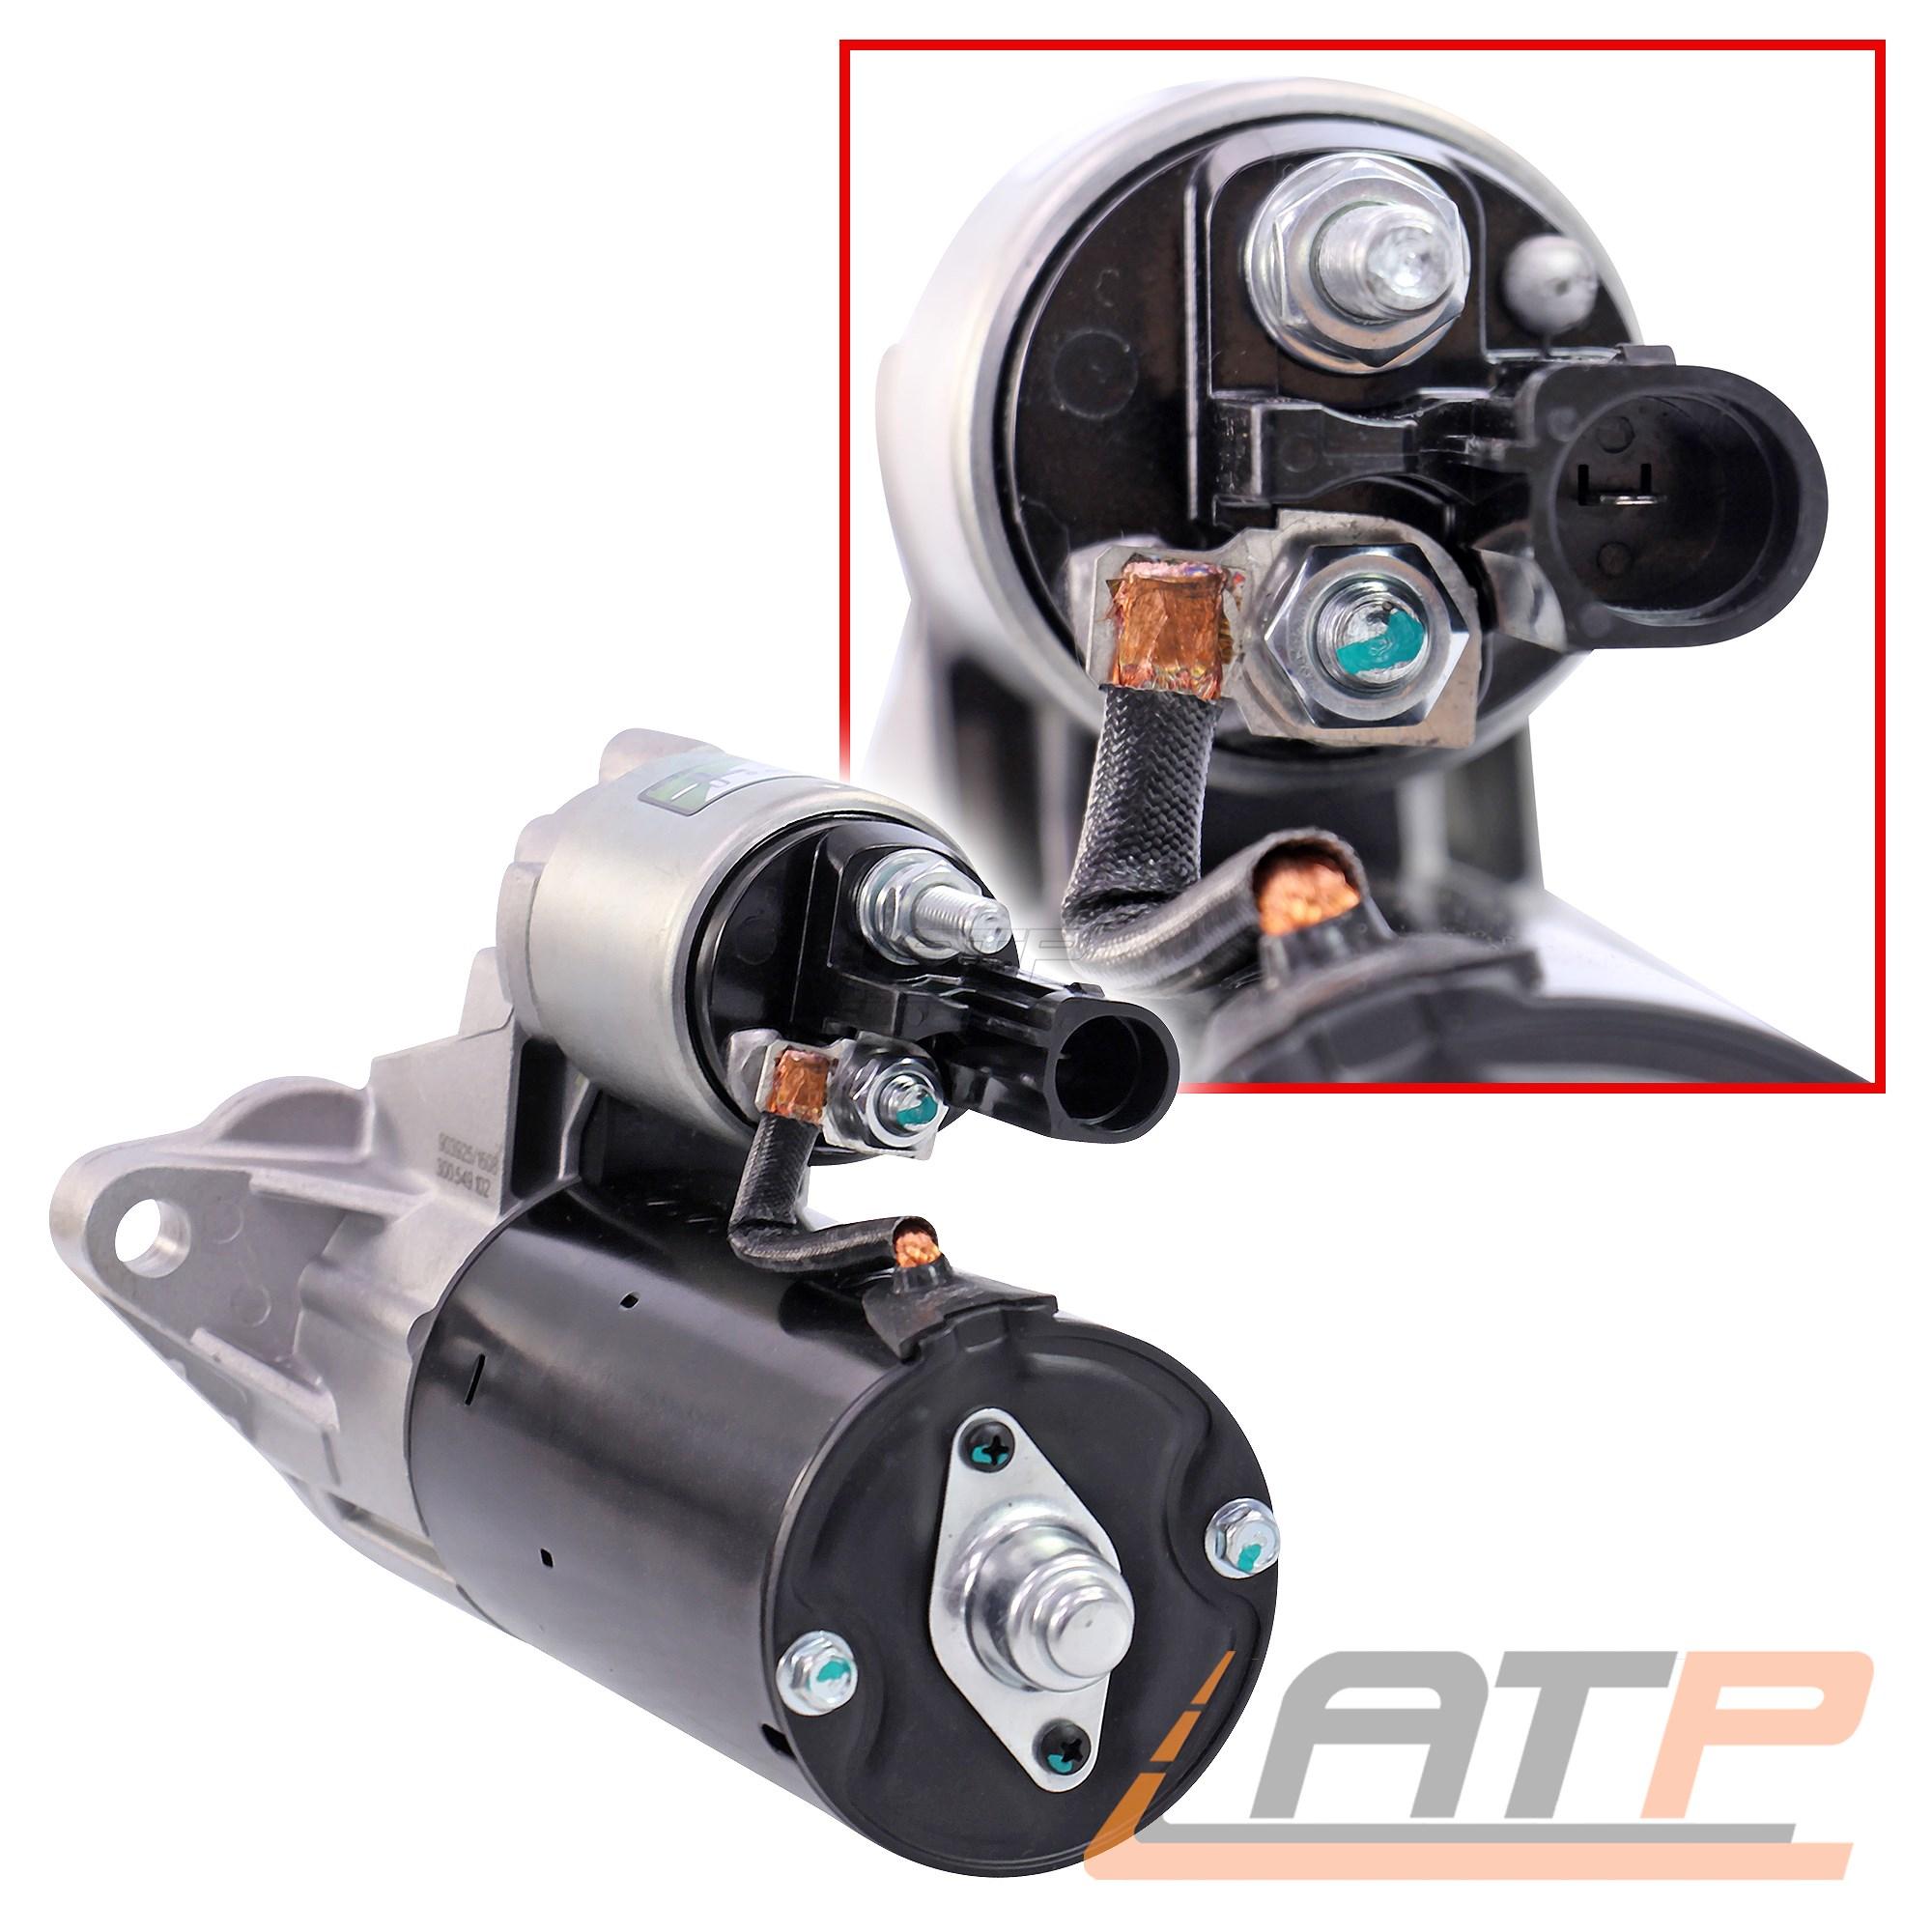 STARTER AVVIATORE 1,7 KW VW Caddy 3 1.9 TDI BJ 05-08 EOS 1f 2.0 TDI TFSI 3.2